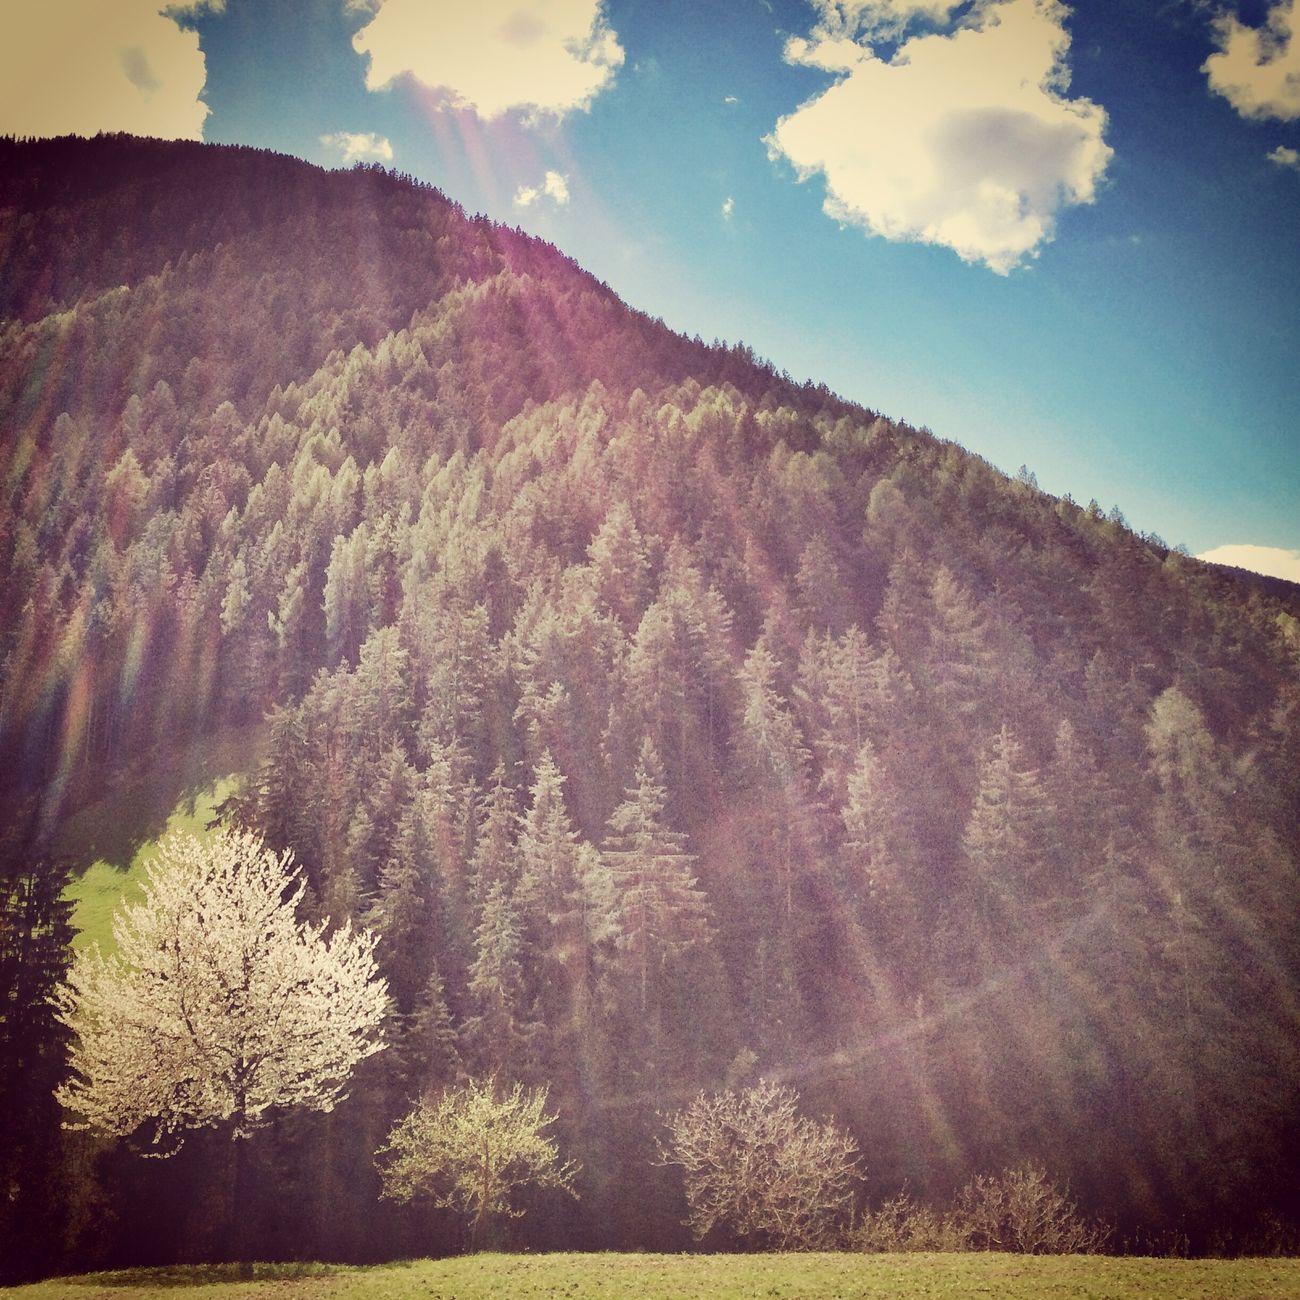 Sky Mountains Trees Landscape